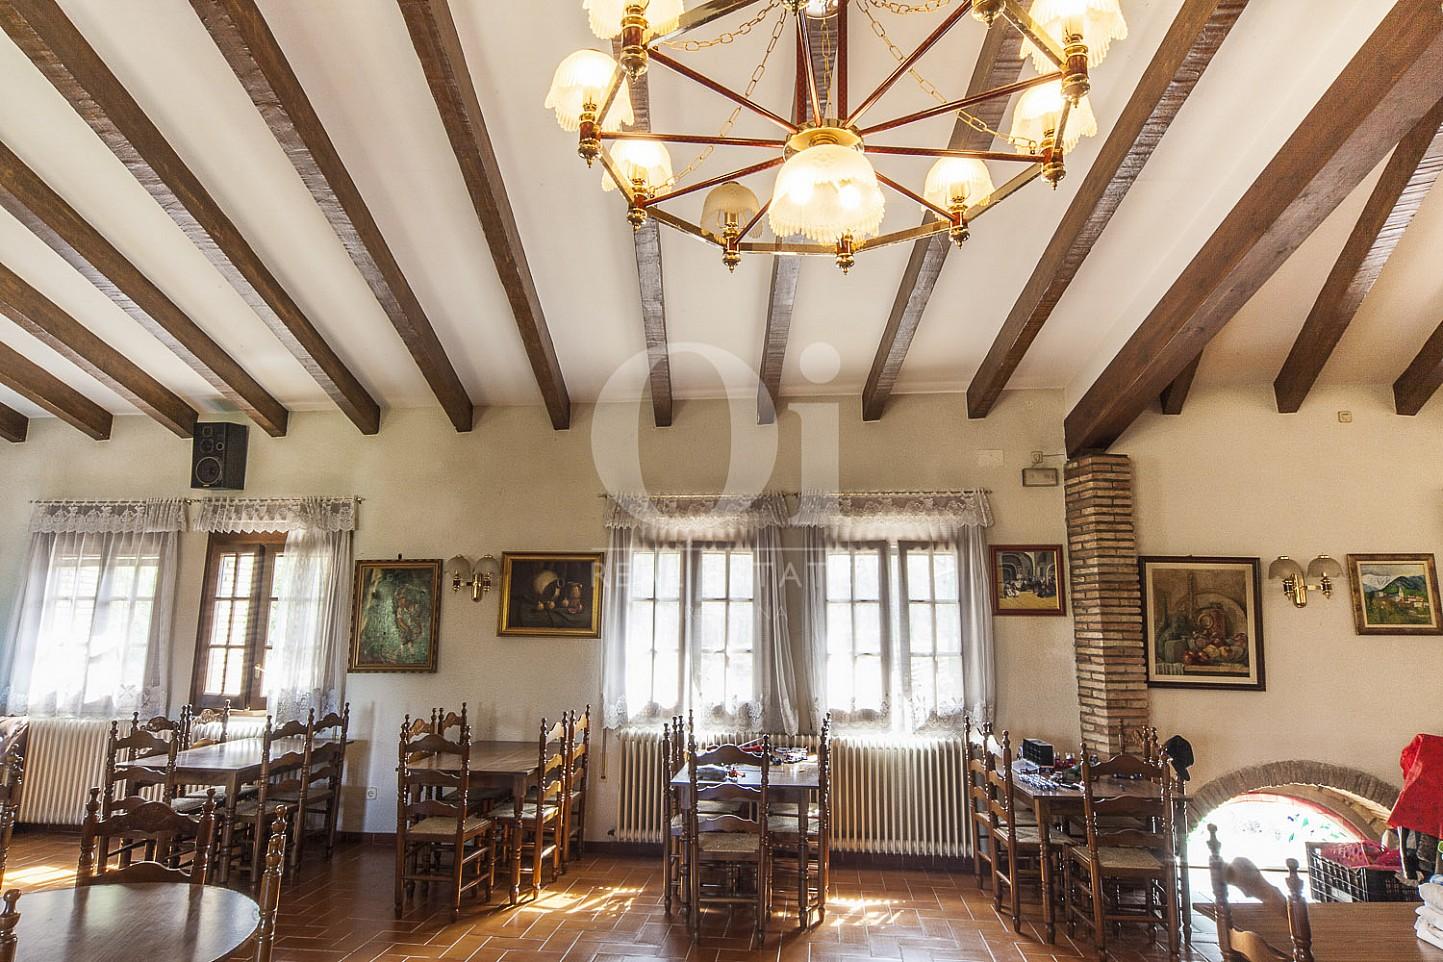 Zona restaurante de casa en venta en Borrassà, alto Ampurdán, Gerona